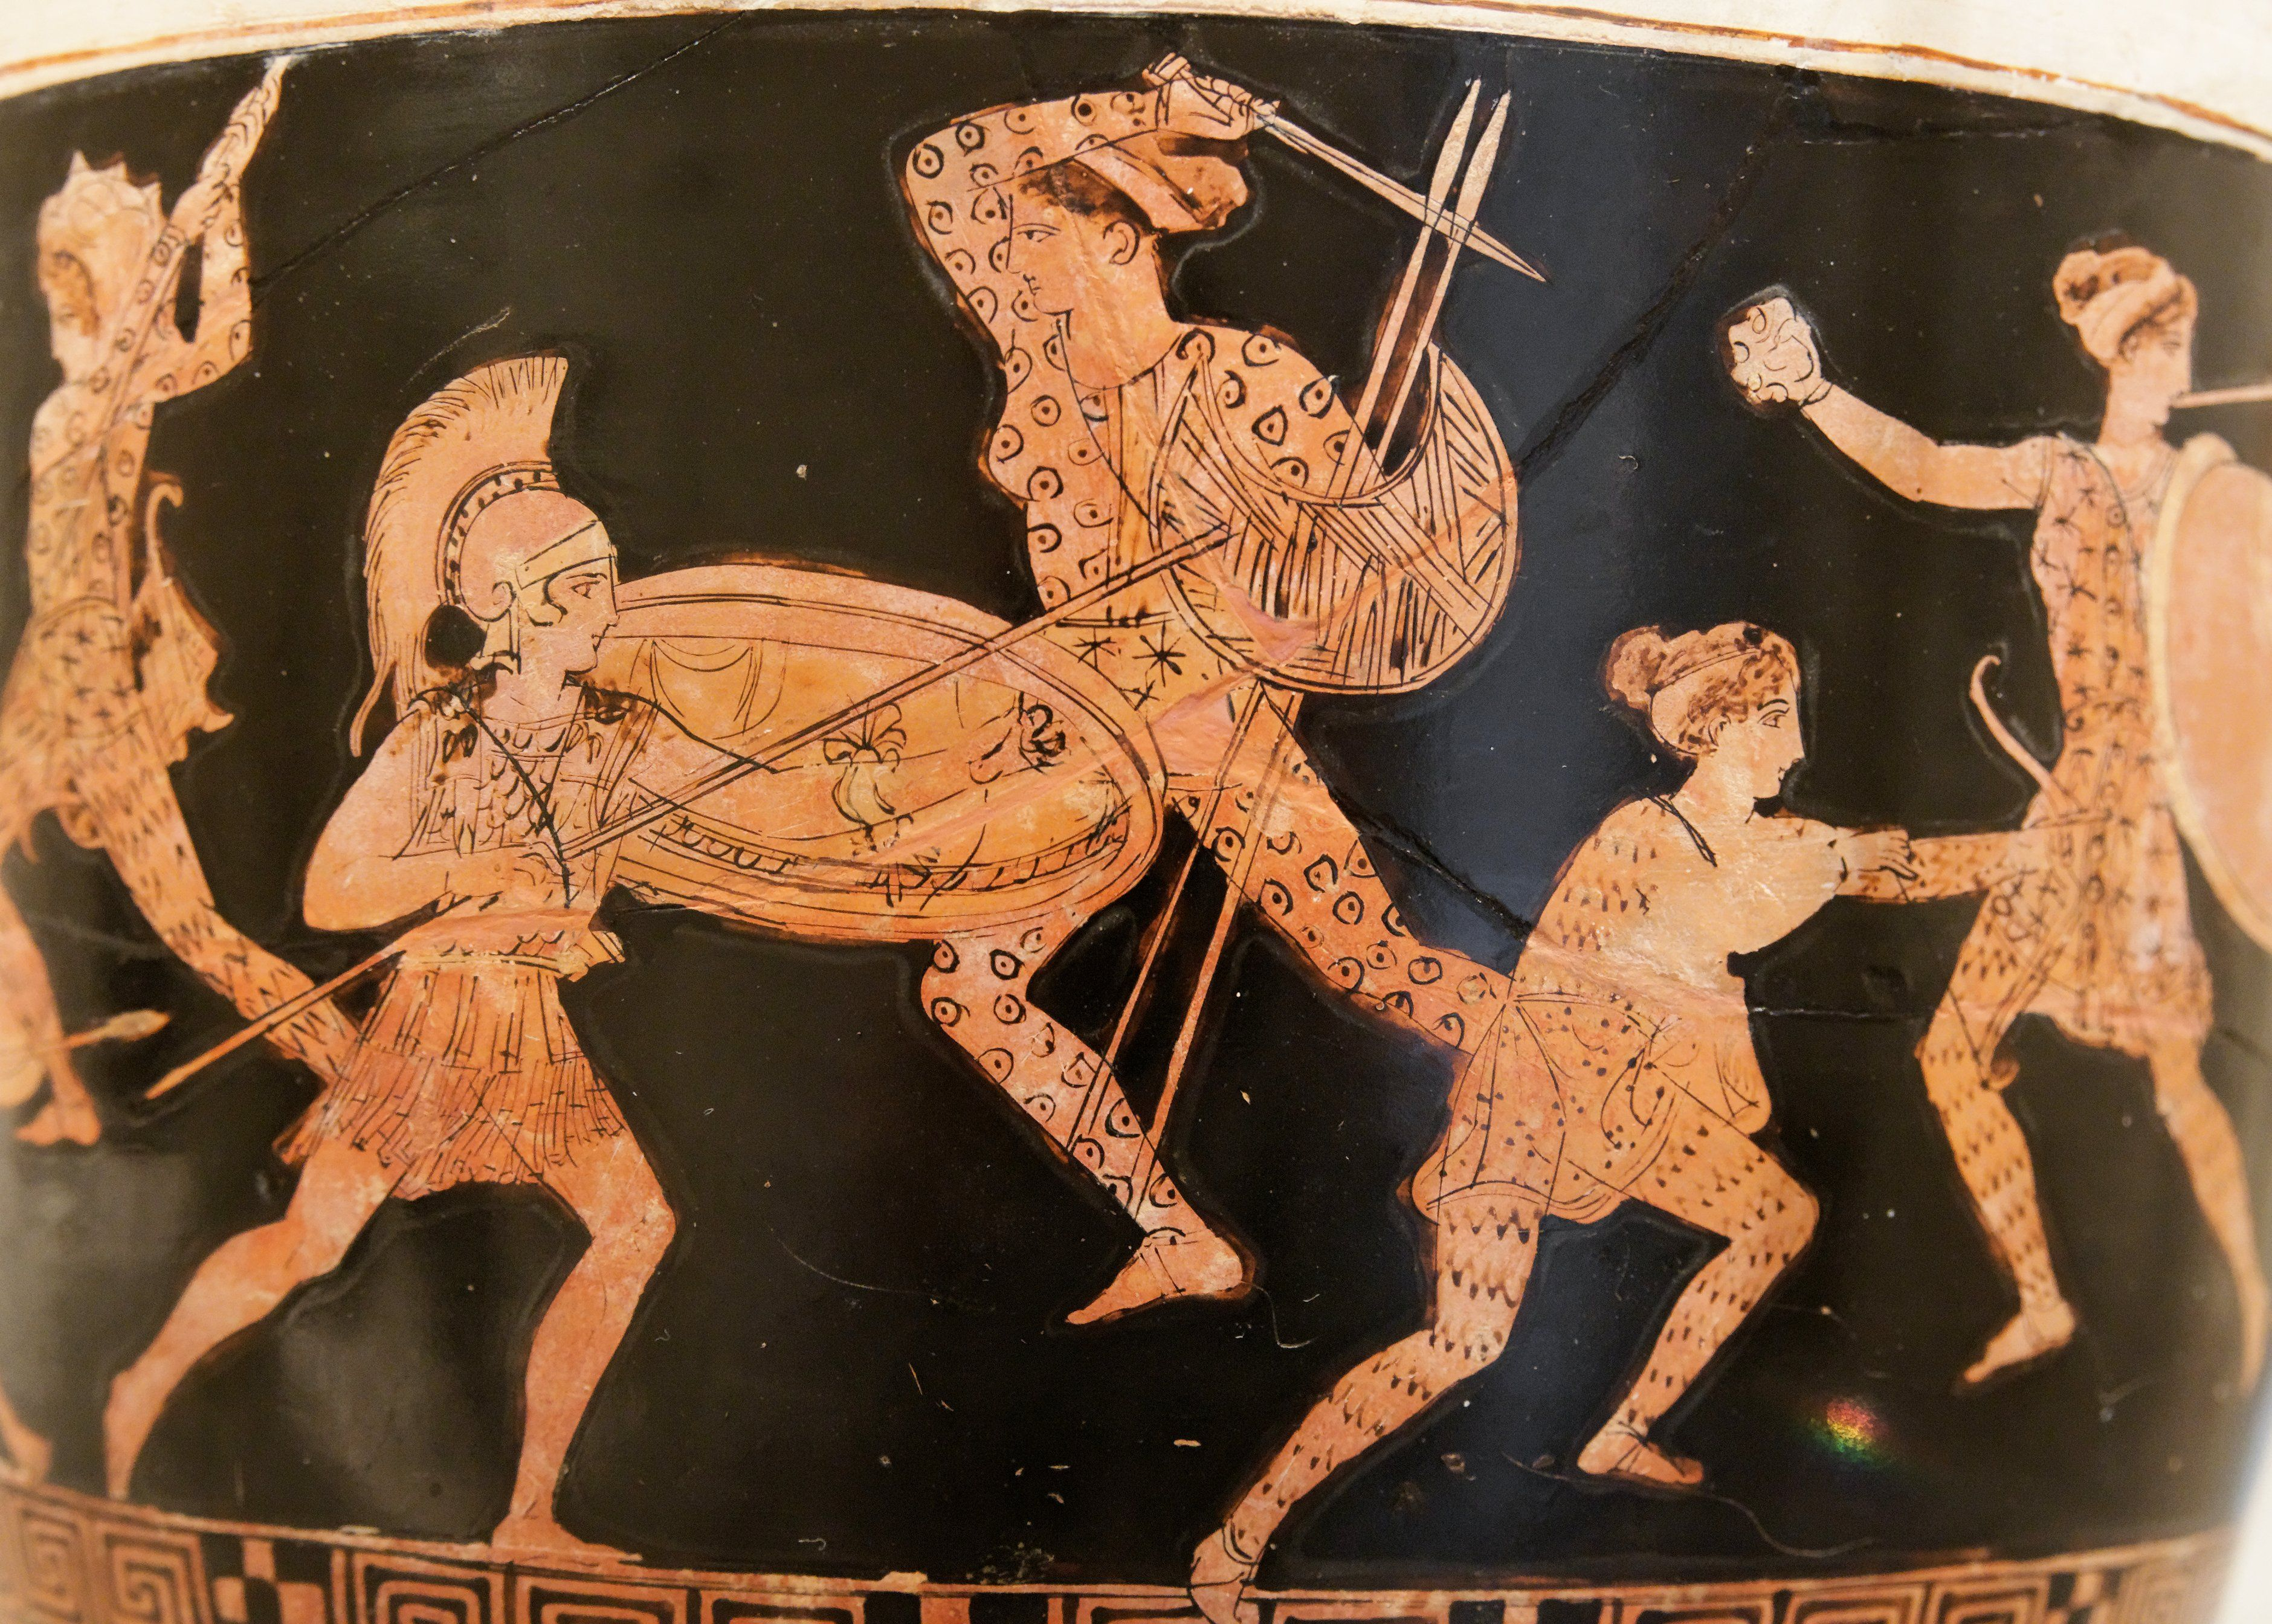 Greek Artwork | Vasos gregos, The wonders, Amazonas